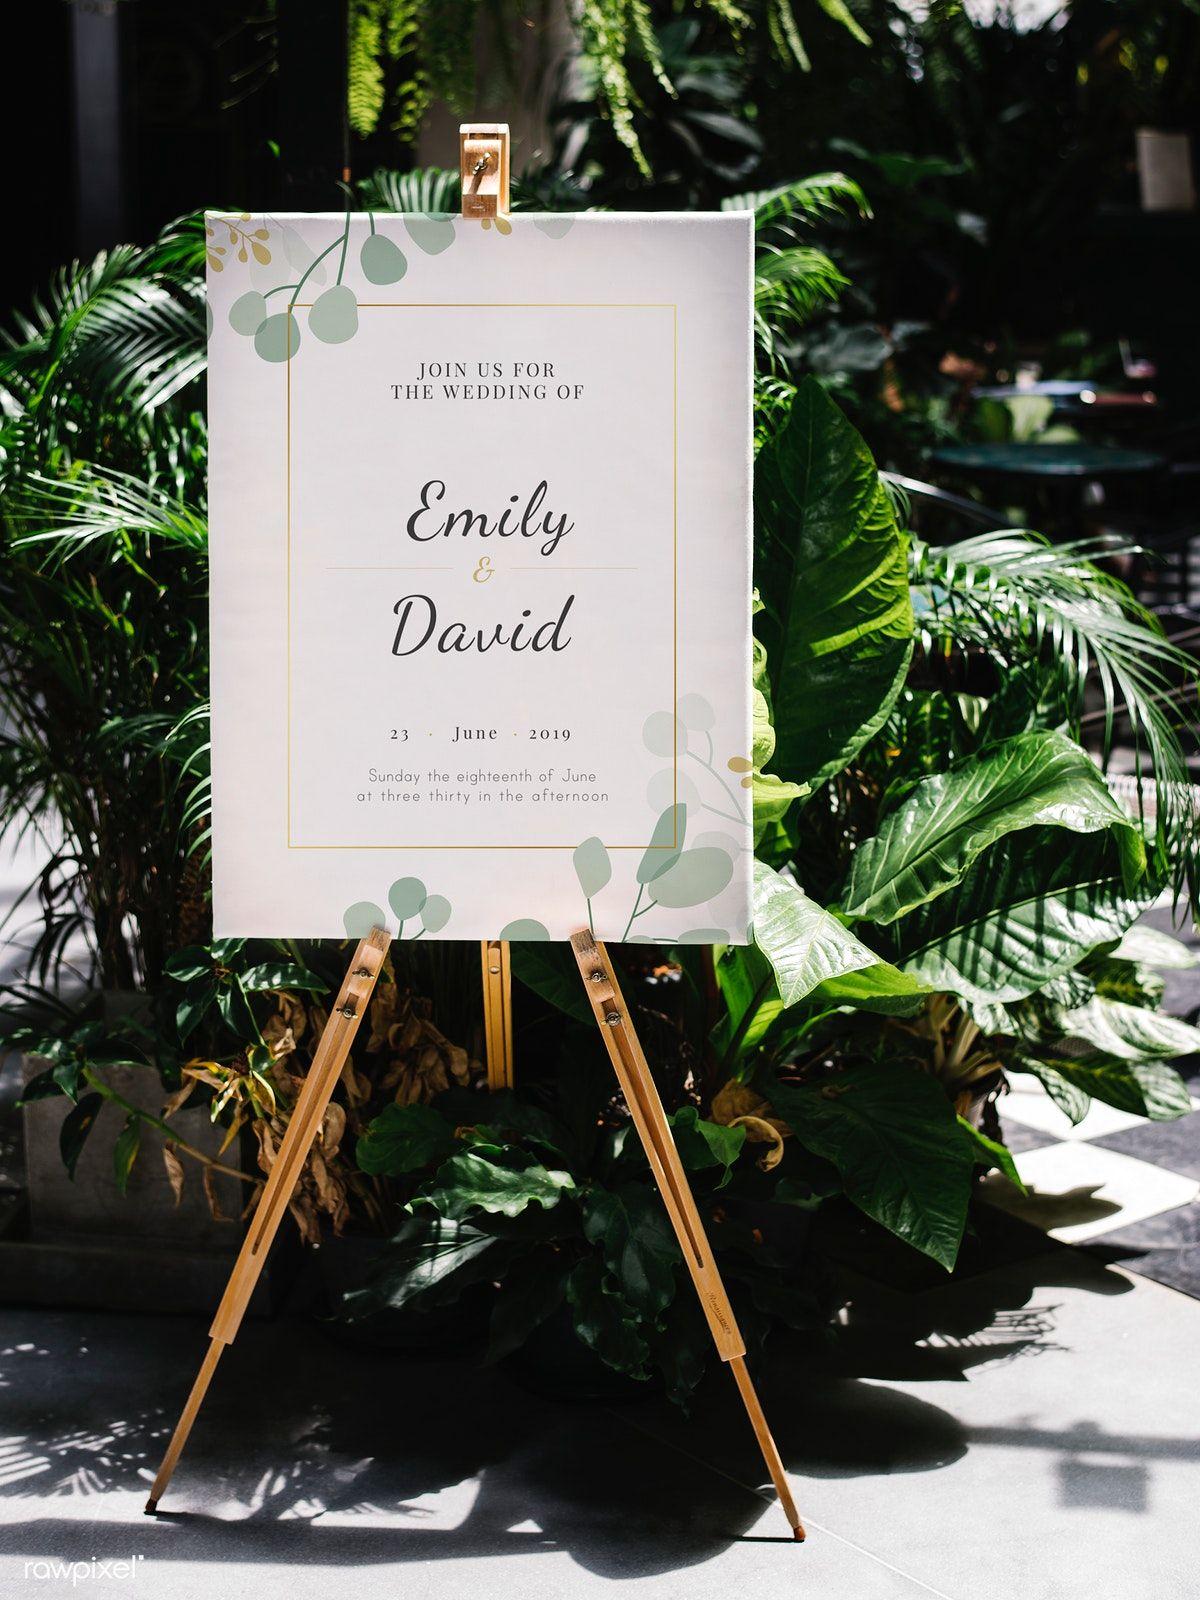 Download premium image of Summer wedding announcement